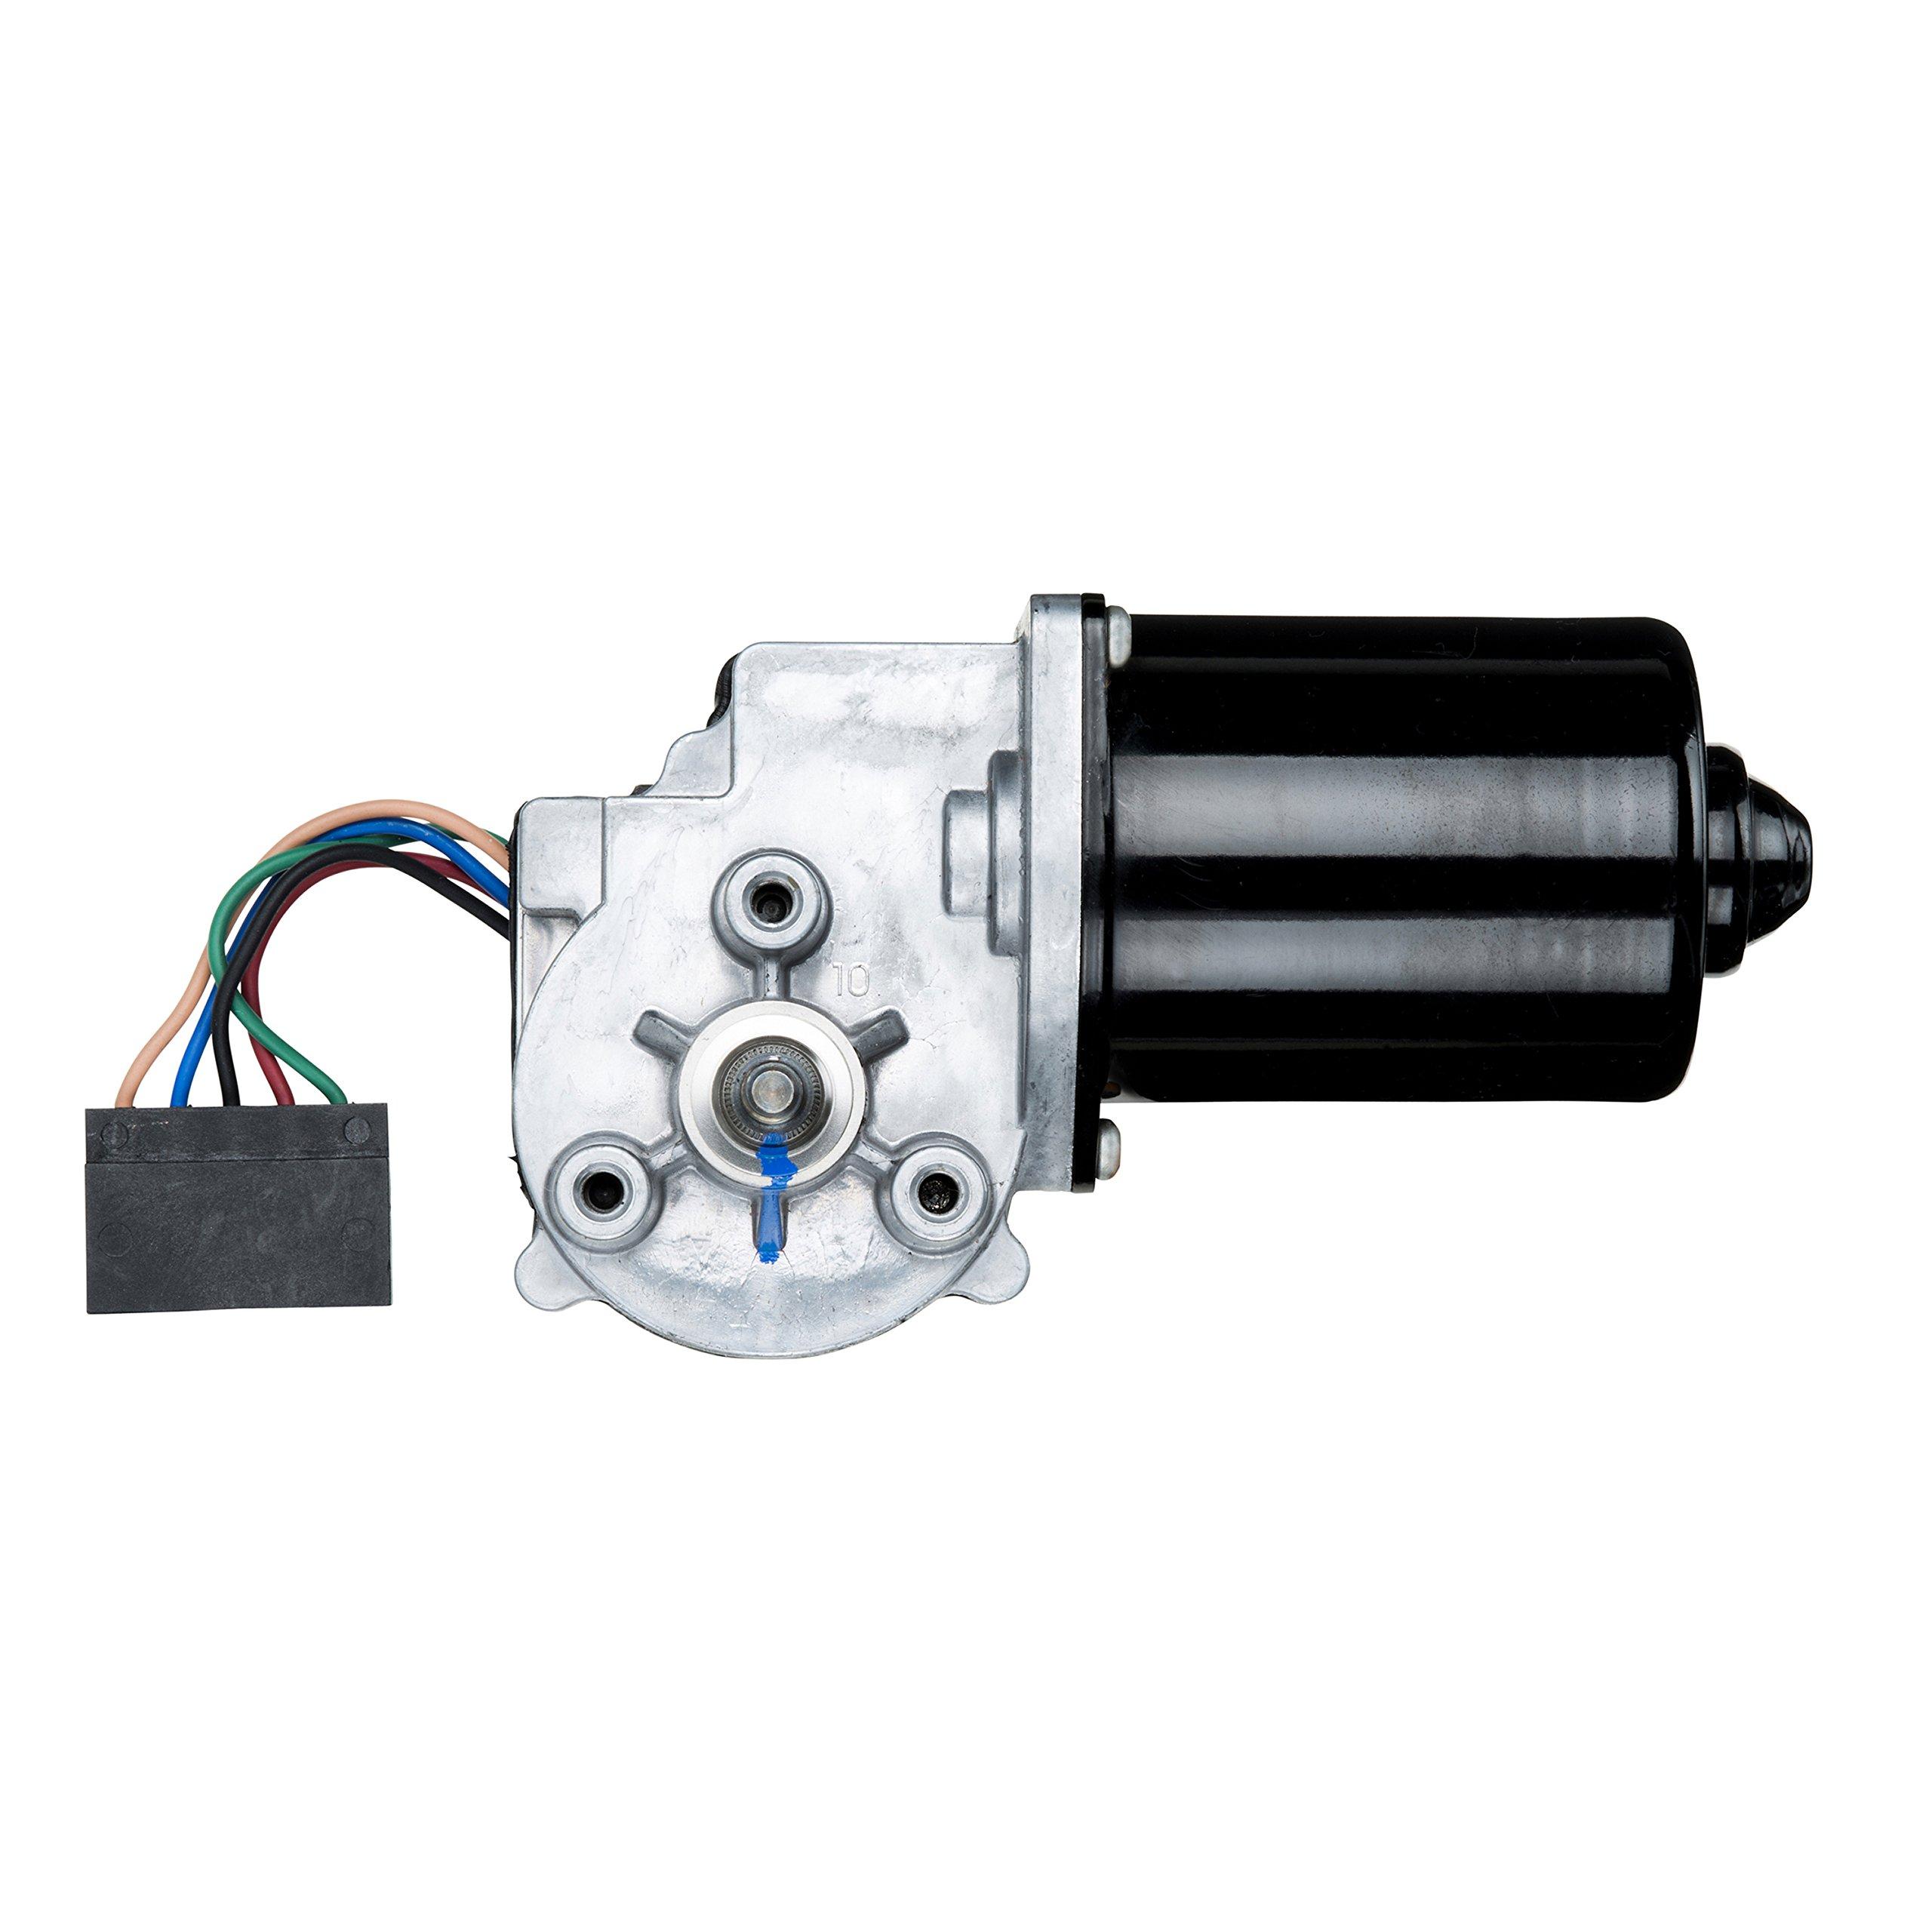 Wexco  Wiper Motor, 105716 24V, 32Nm Dynamic Park J3 Wiper Motor with JE/UT Connector